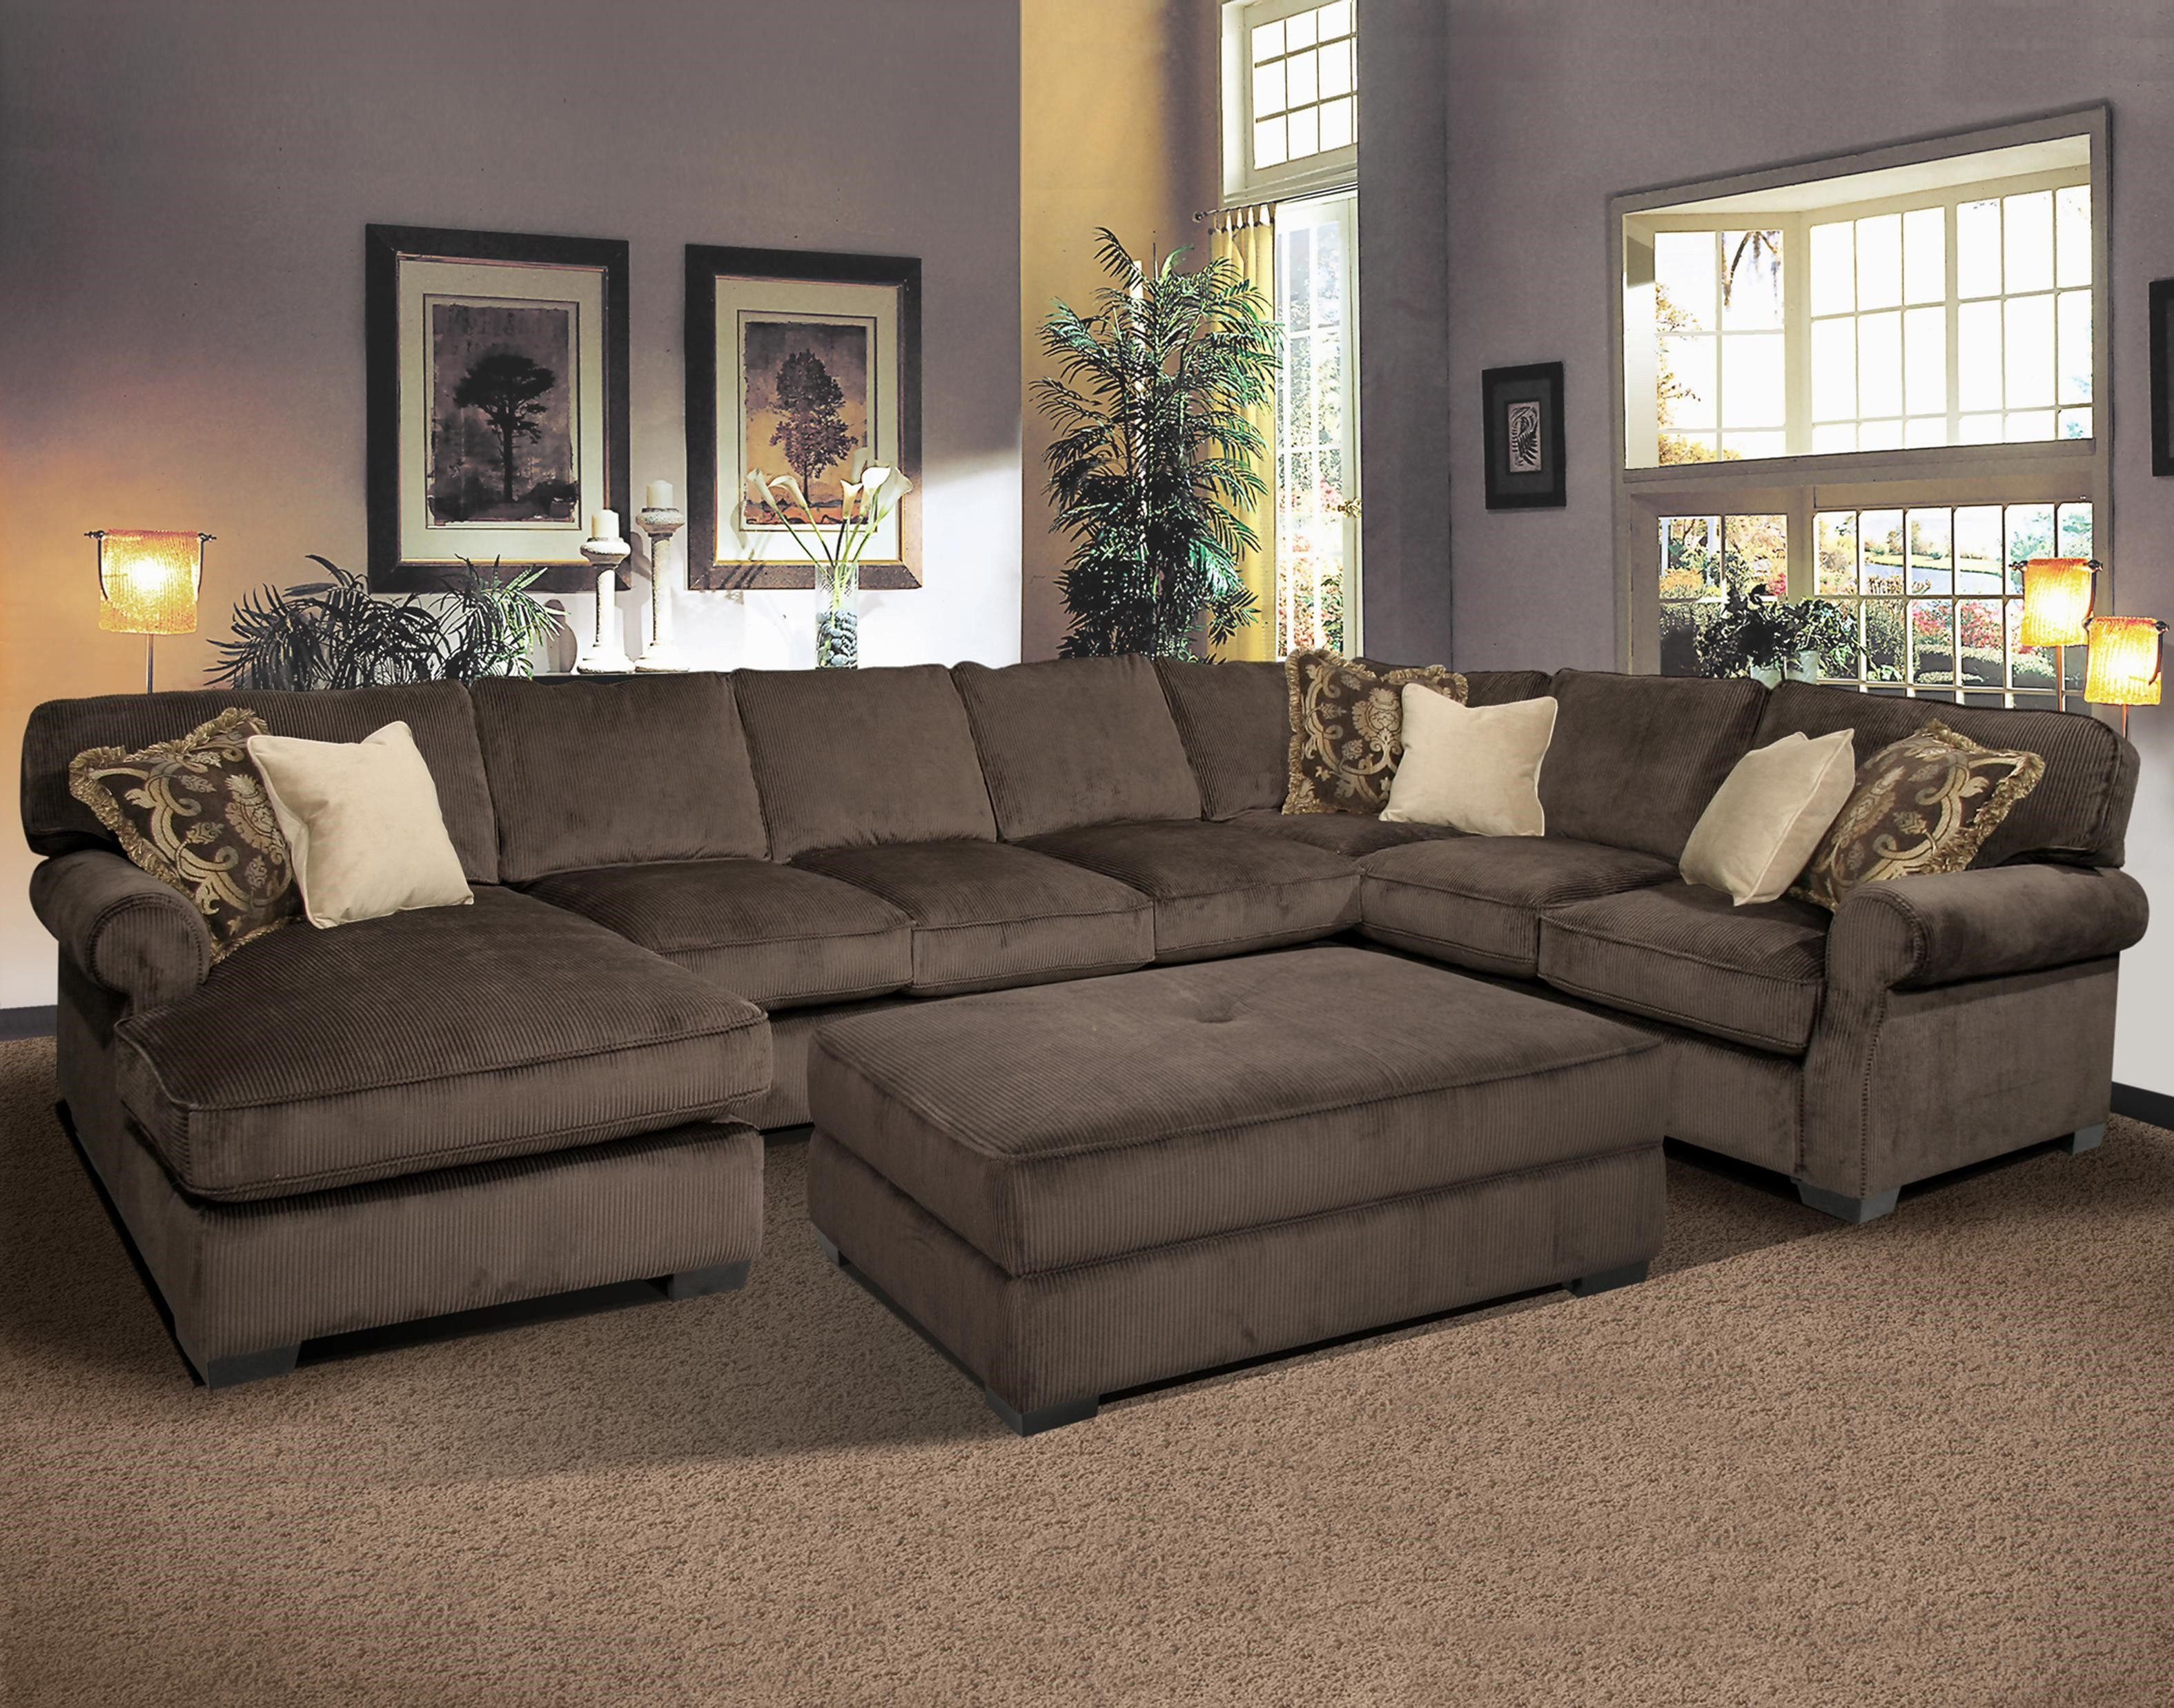 Comfortable Living Room Furniture fortable Living Room sofas Design with Elegant